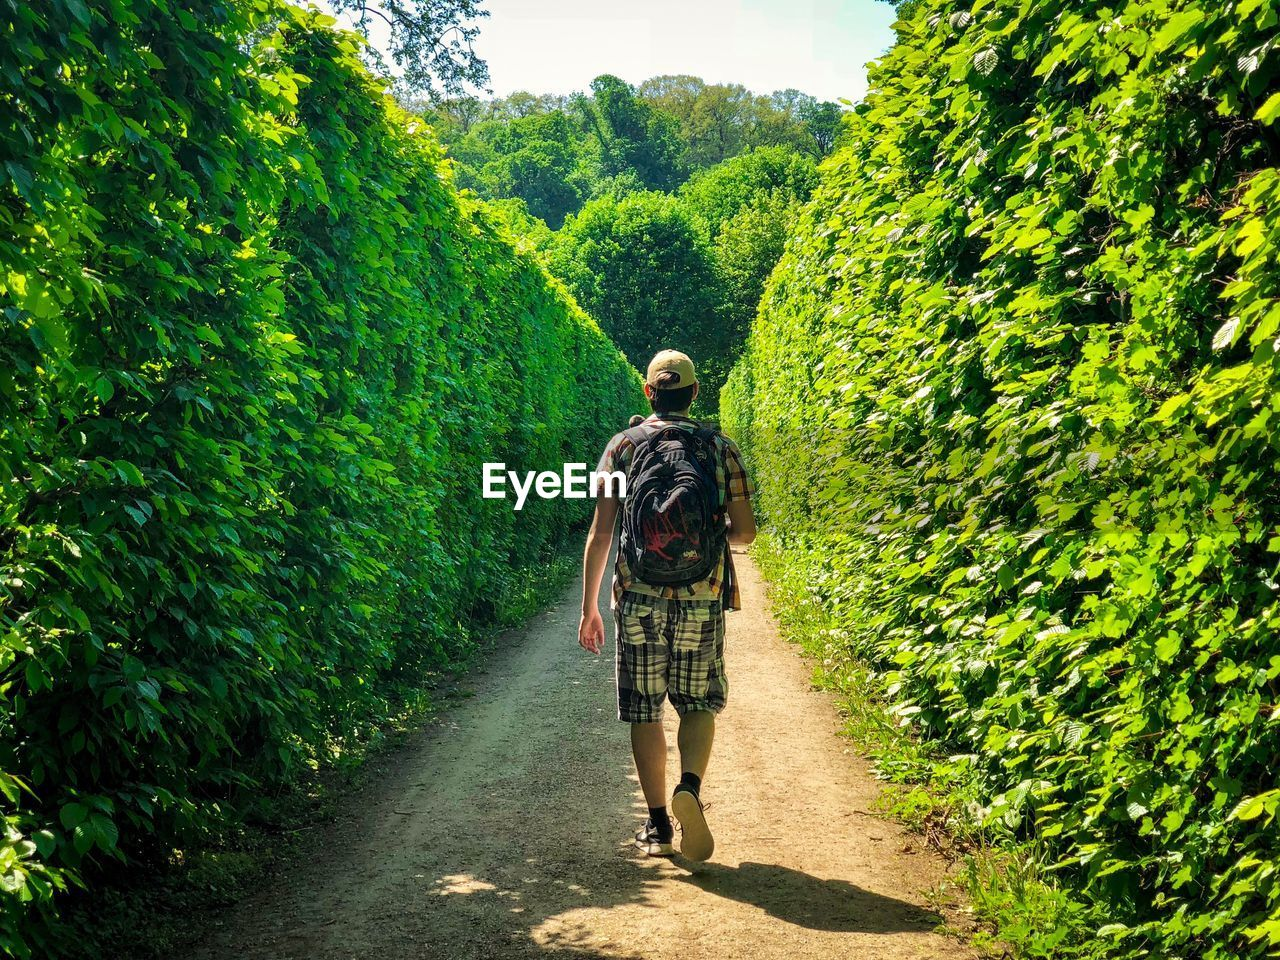 Rear View Of Man Walking On Footpath Amidst Plants